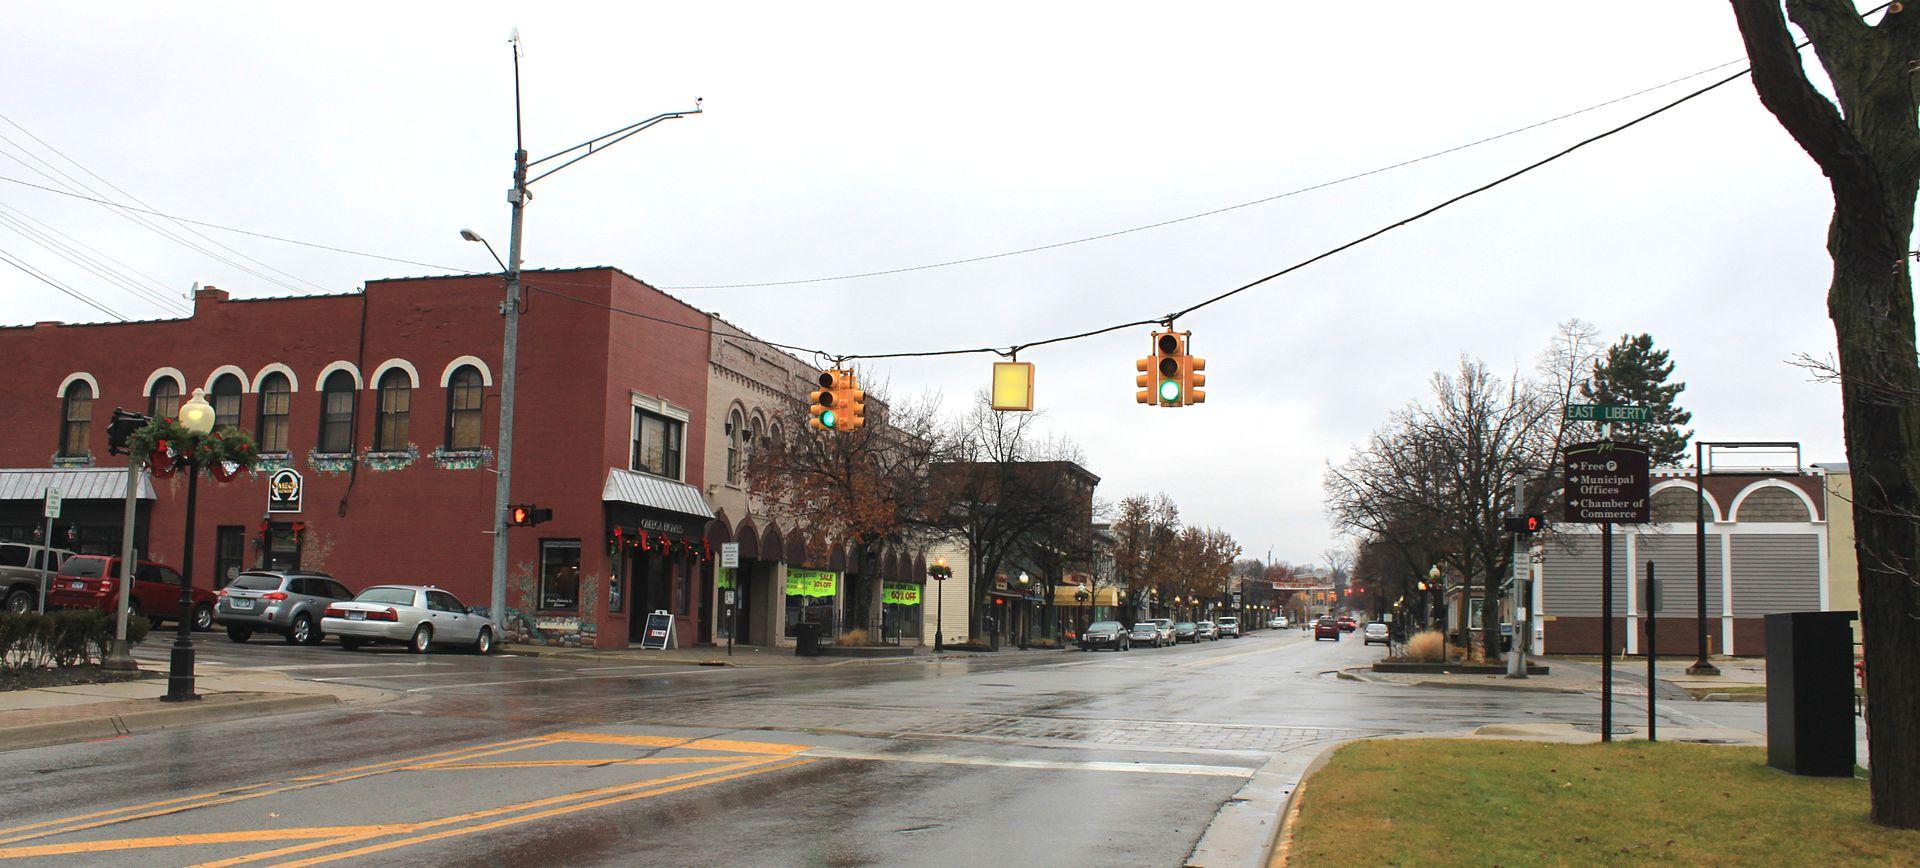 downtown Milford, MI